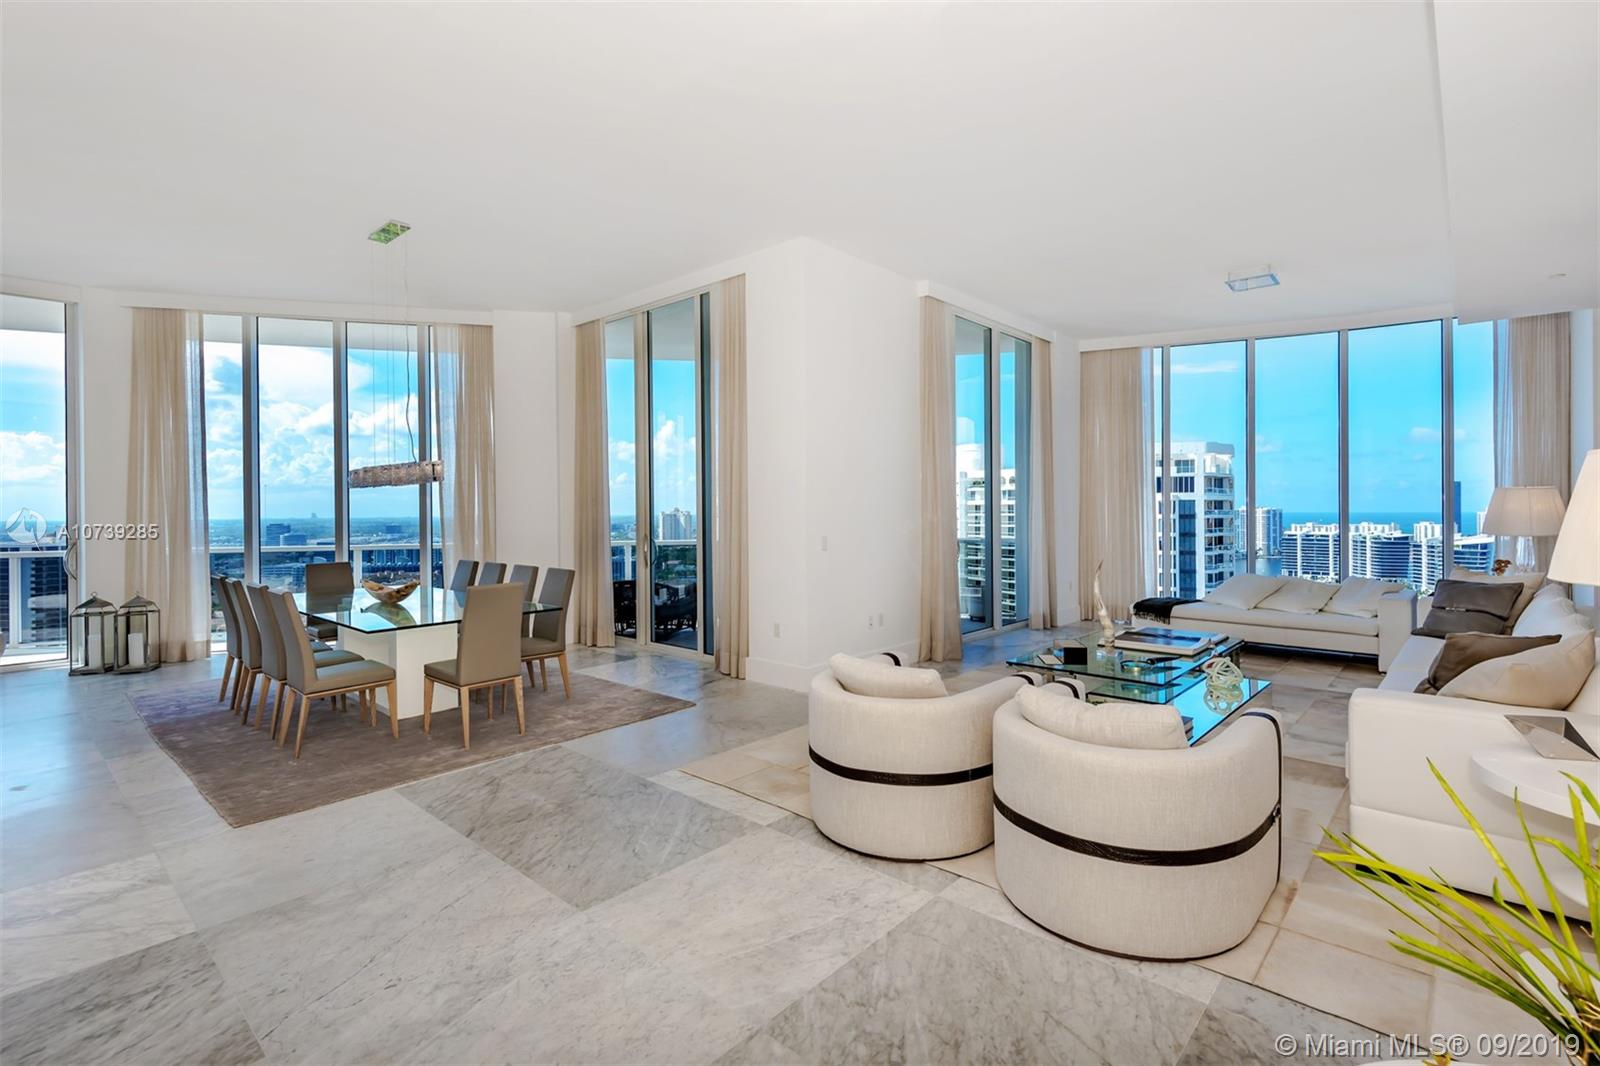 4100 Island Blvd #PH-3, Aventura, FL 33160 - Aventura, FL real estate listing